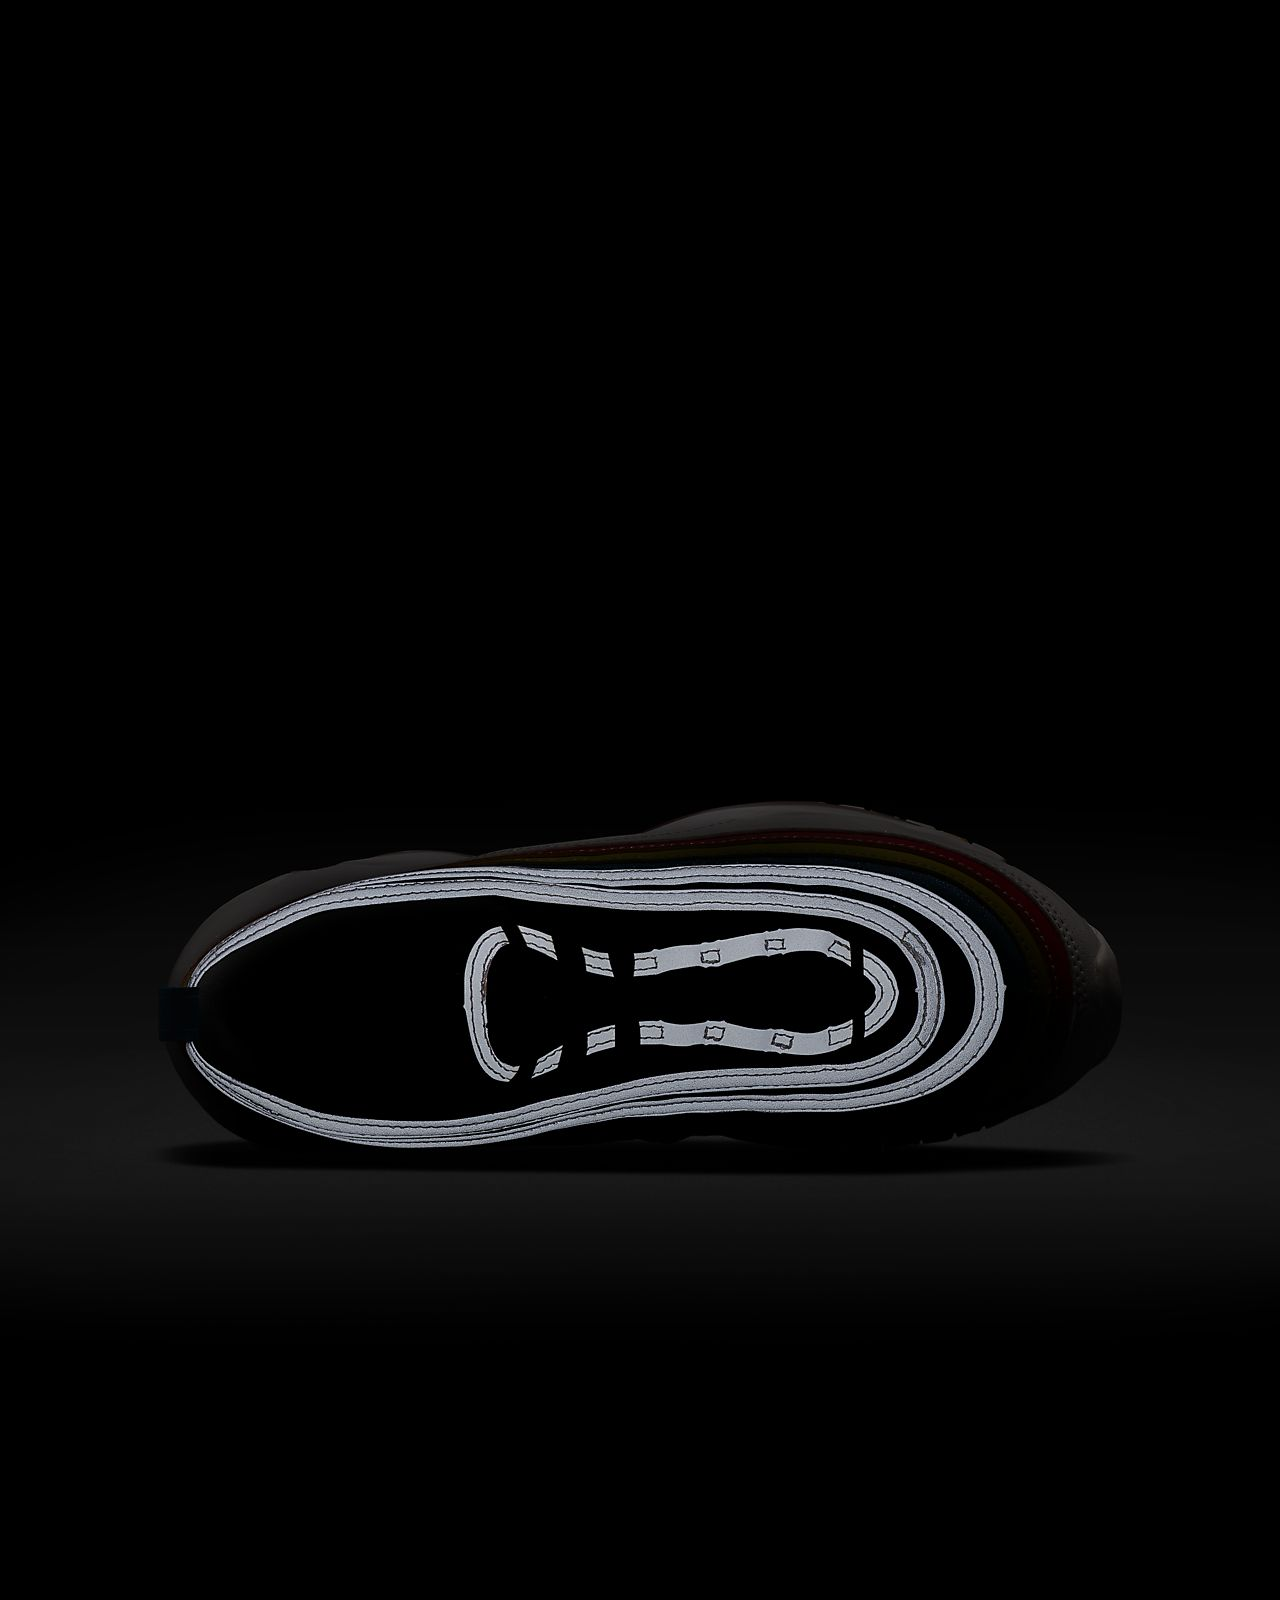 sports shoes ee366 d0035 ... Nike Air Max 97 Big Kids  Shoe